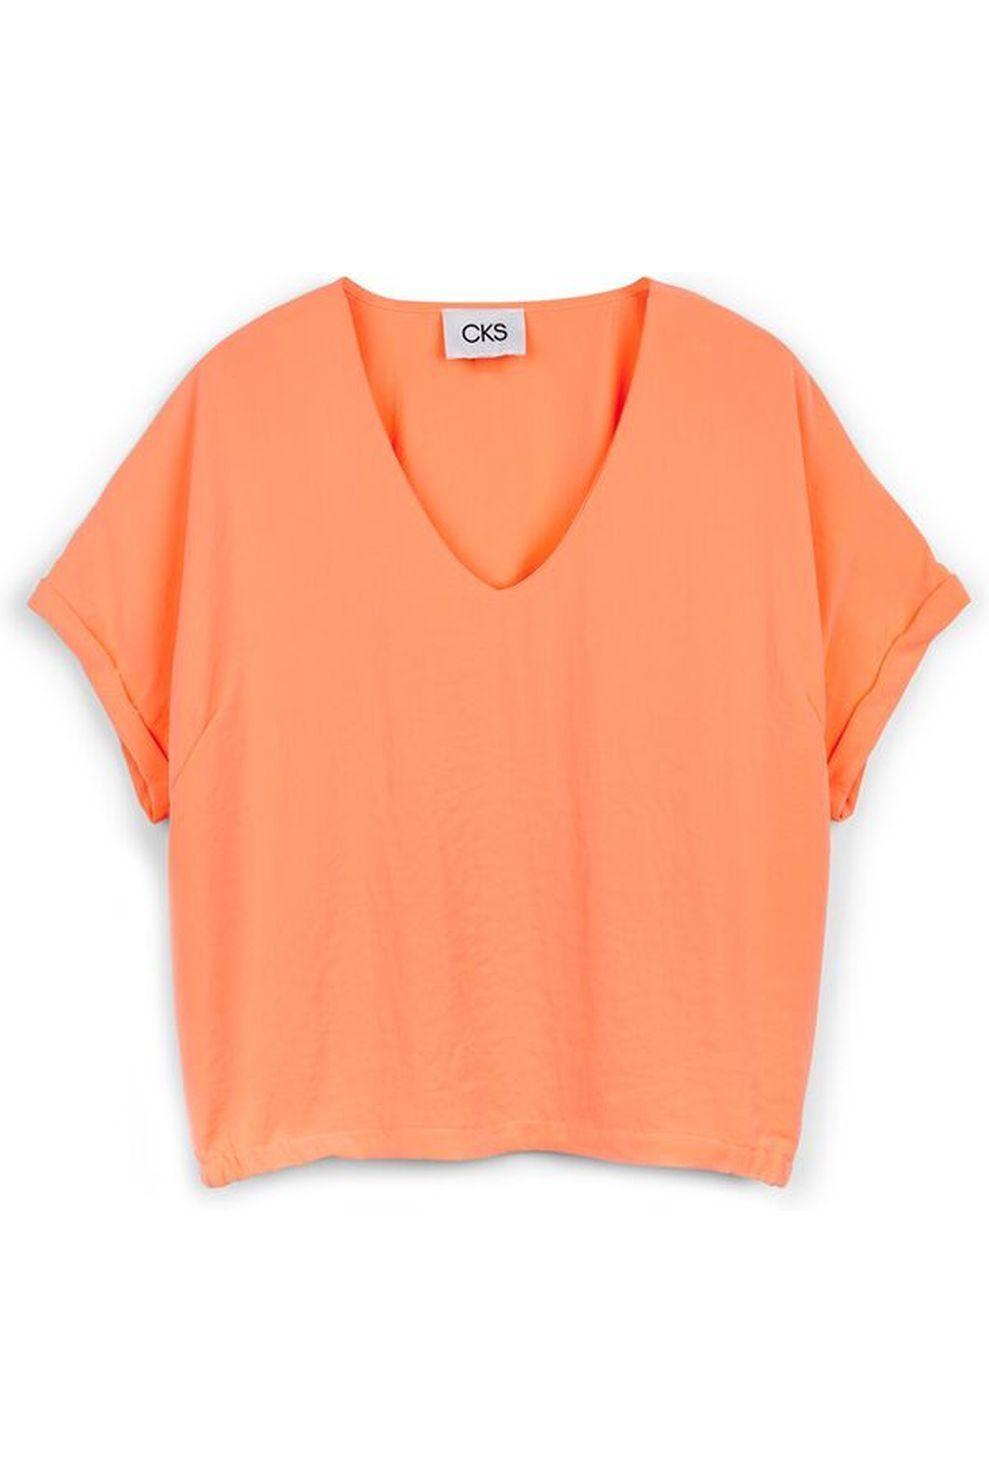 CKS Blouse Ubina voor dames - Oranje - Maten: XS, S, M, L, XL